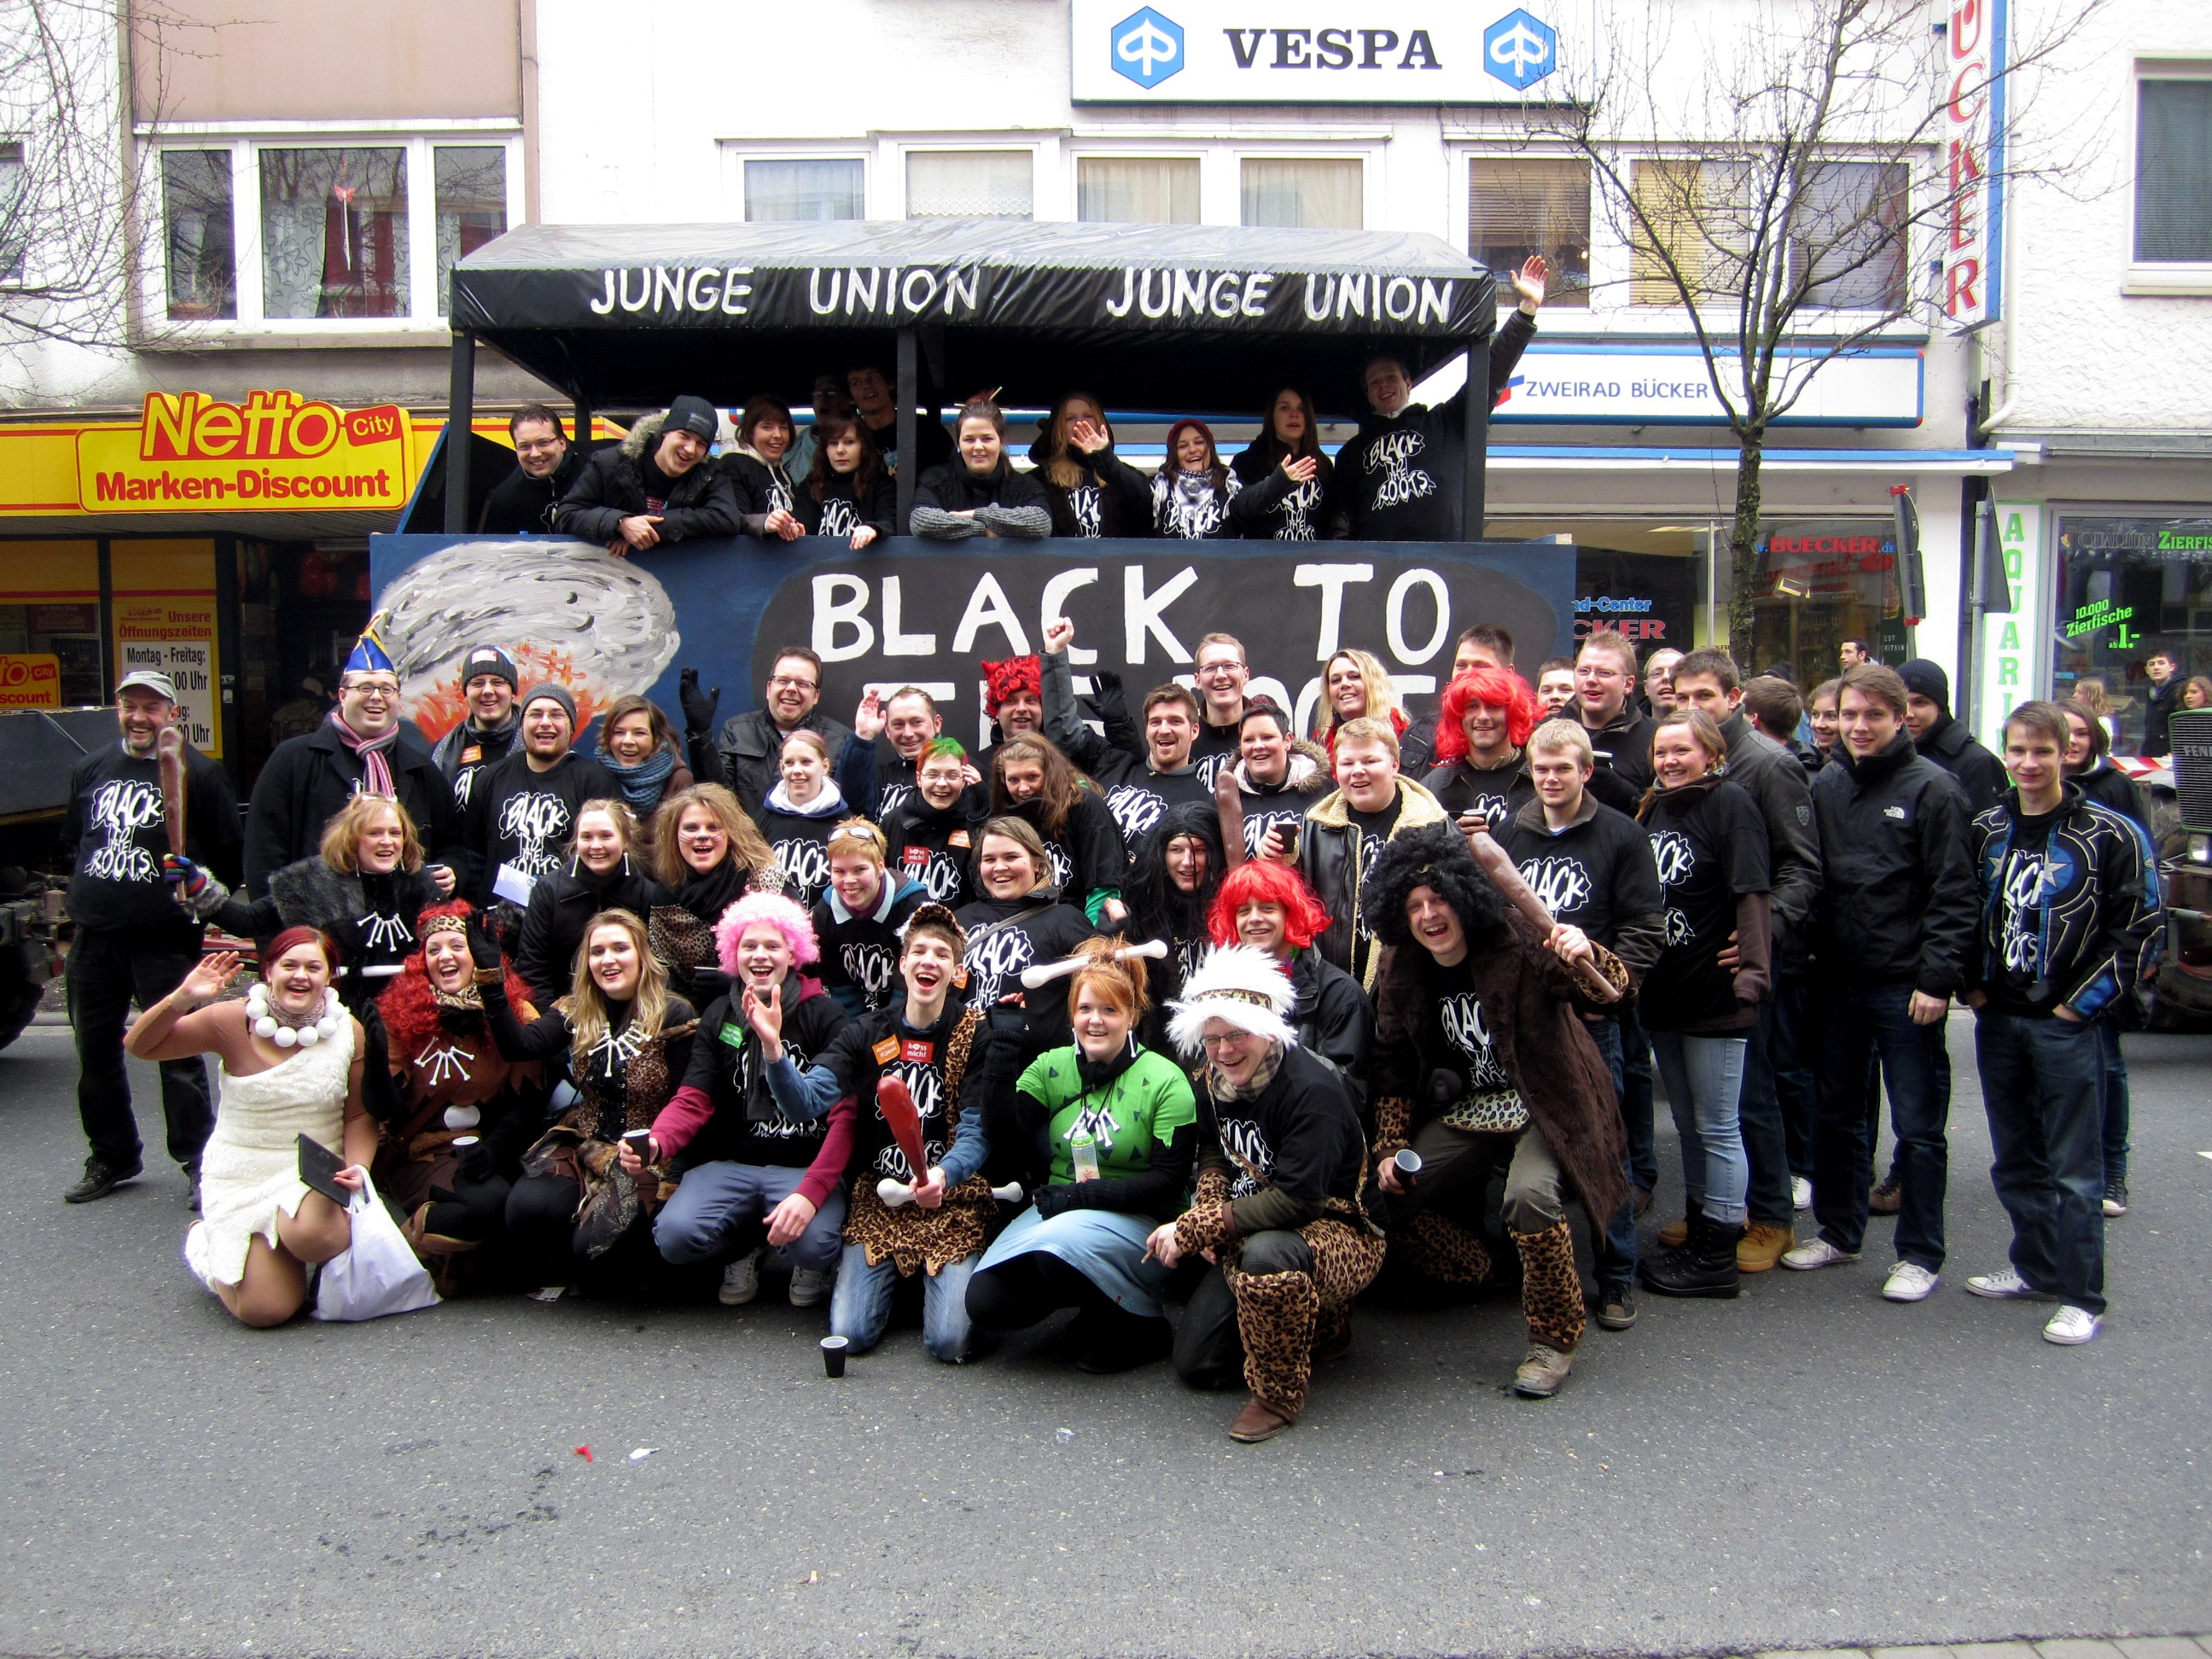 Ossaensamstag 2011